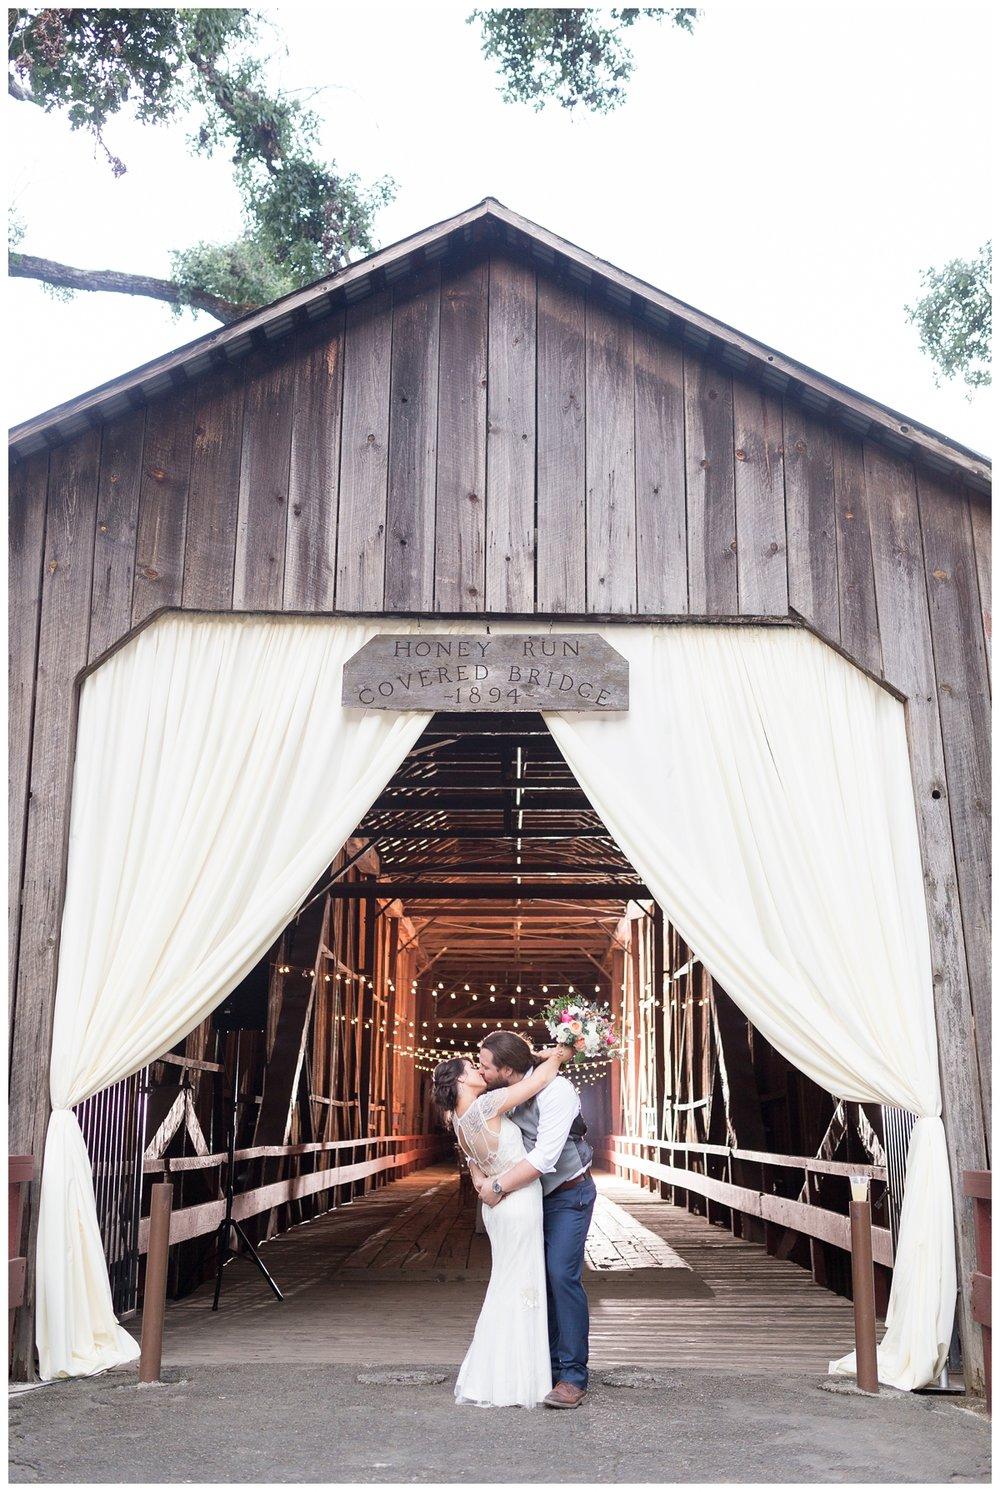 Honey-Run-Covered-Bridge-Wedding-Photos_0769.jpg